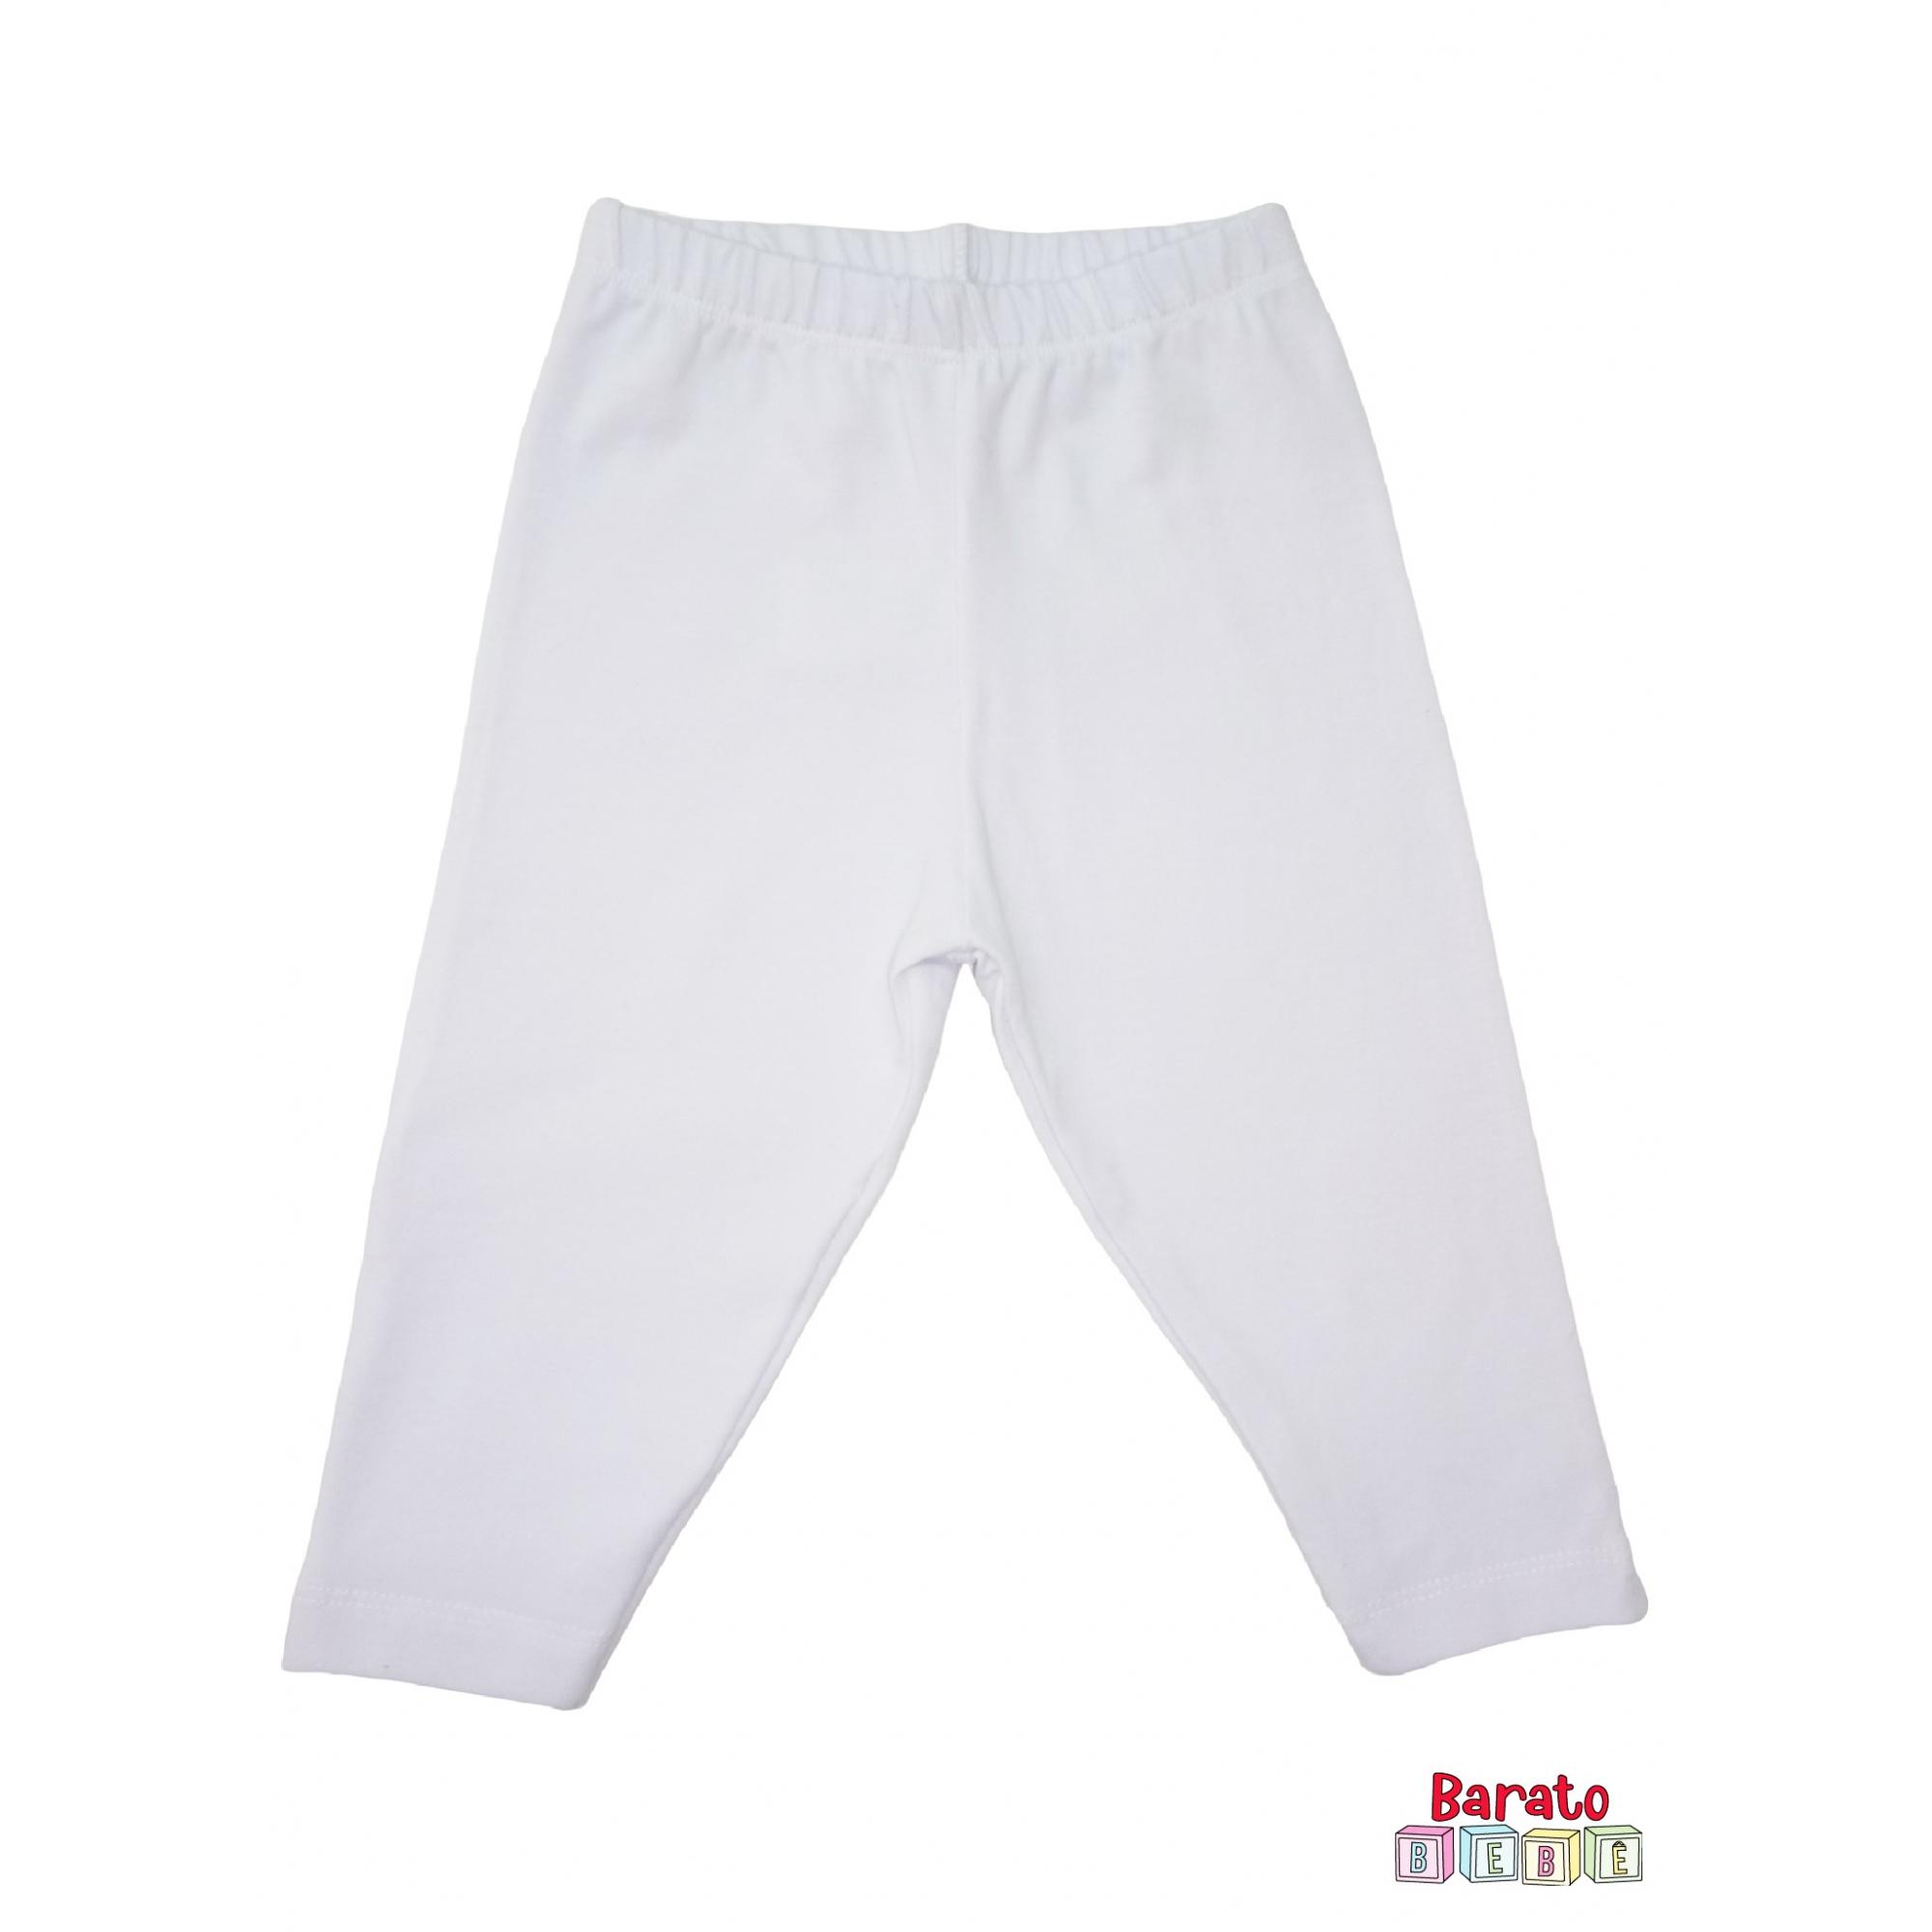 Calça Bebê Cotton Branco (P/M/G) - Mijão - Barato Bebê